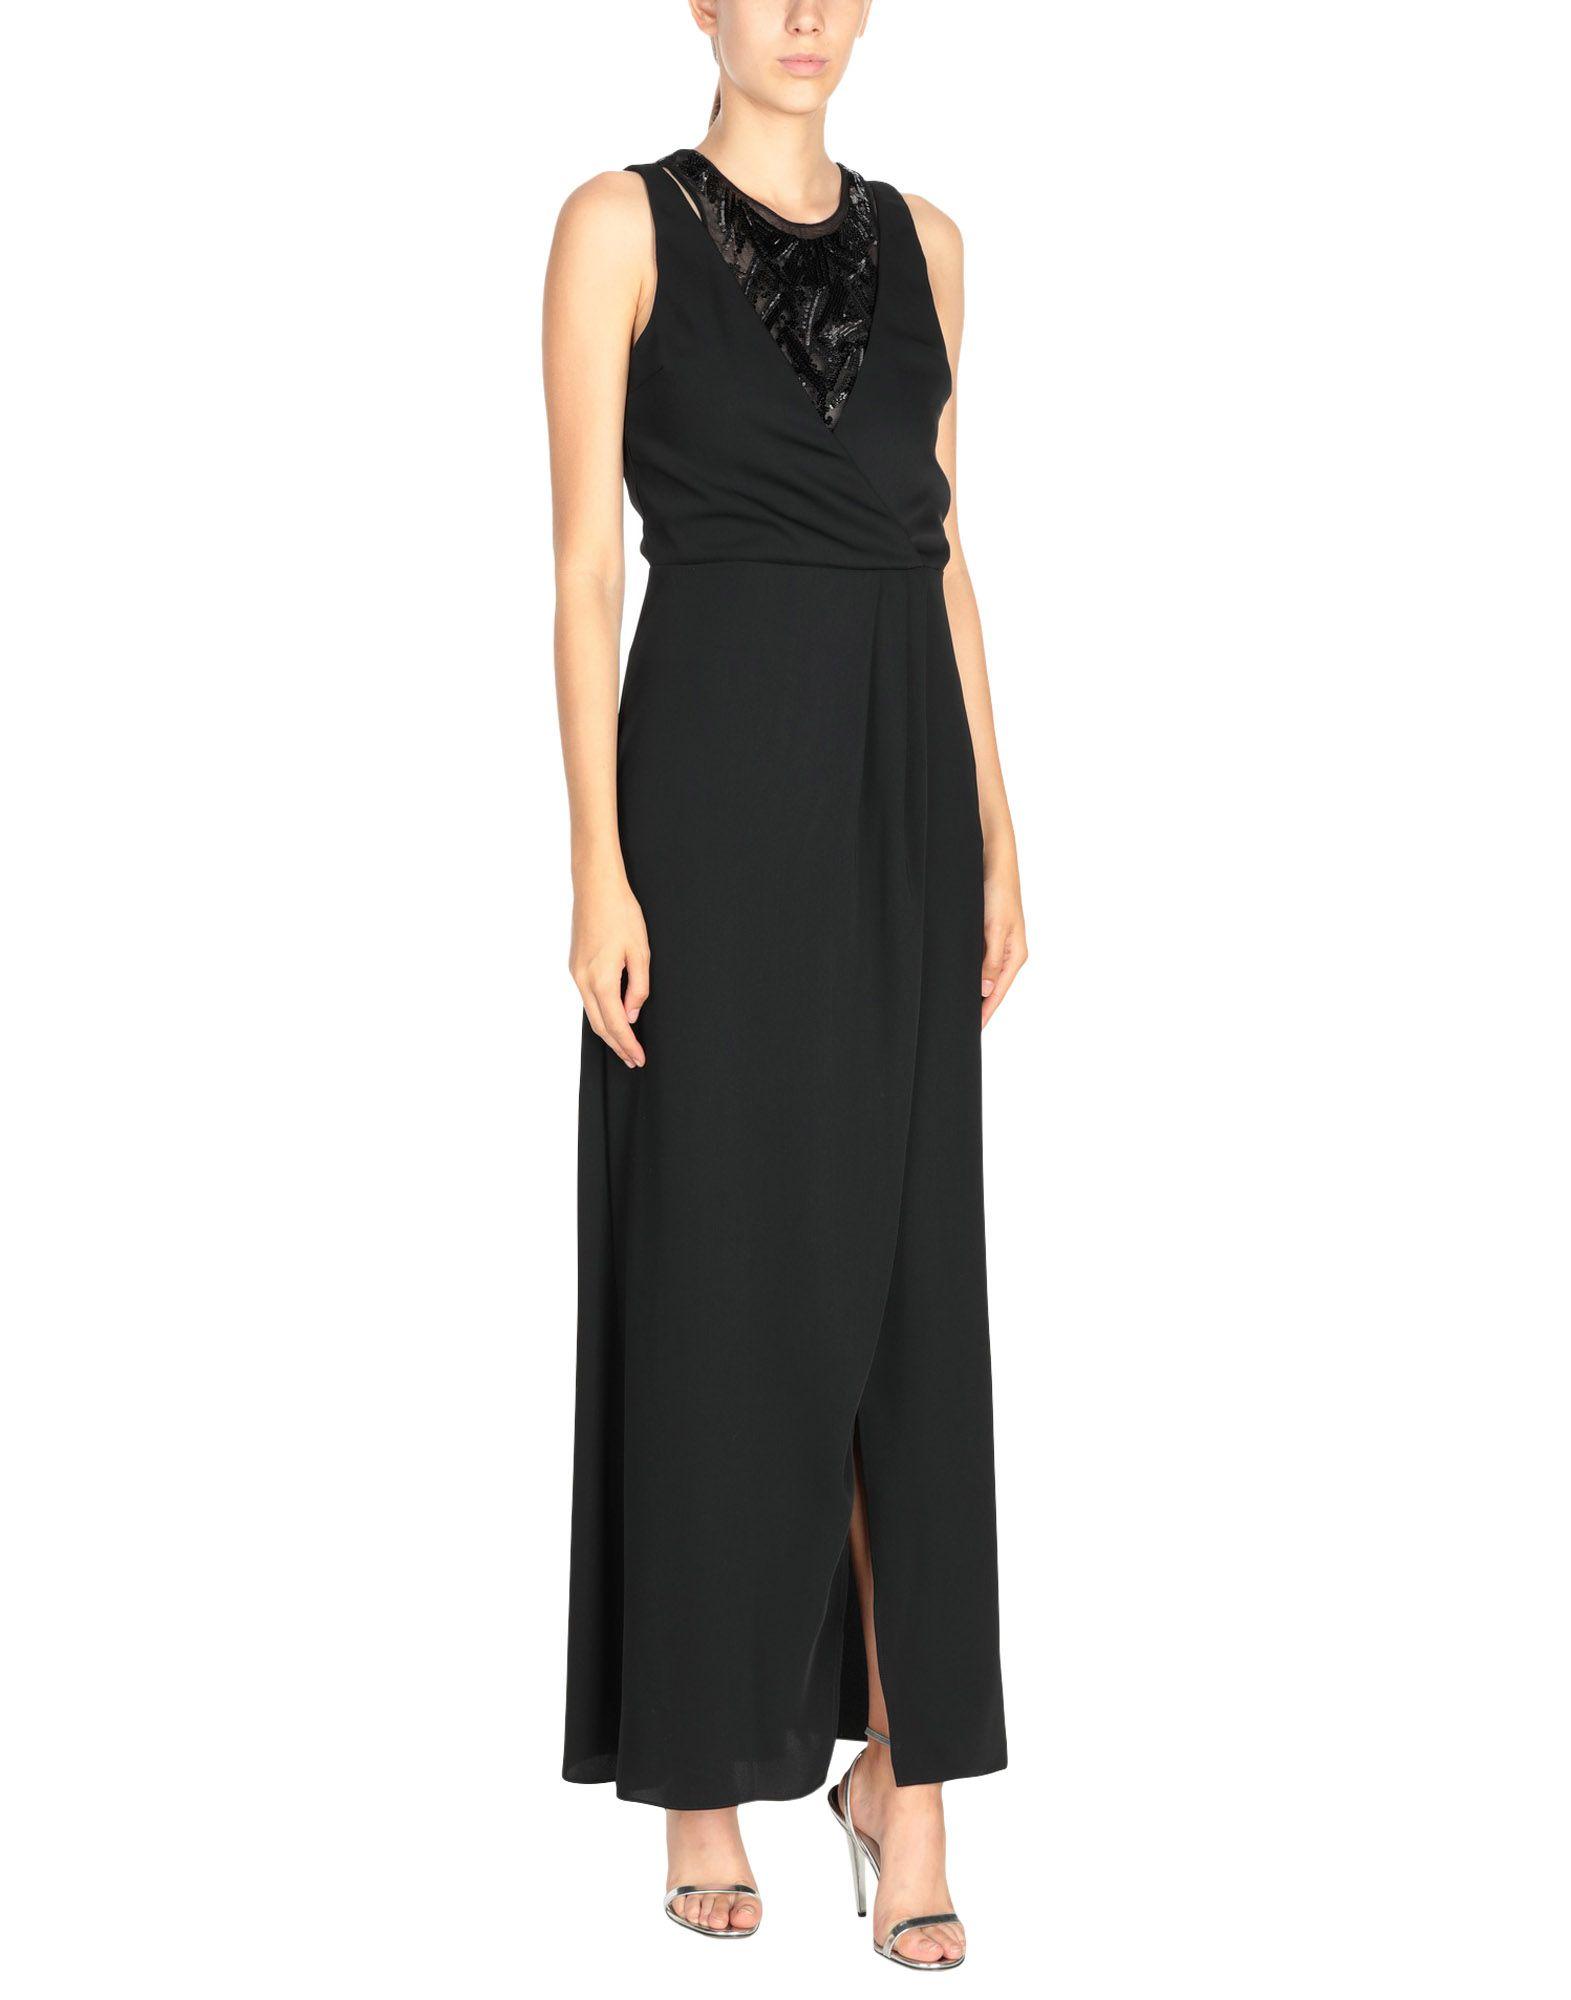 PATRIZIA PEPE SERA Длинное платье